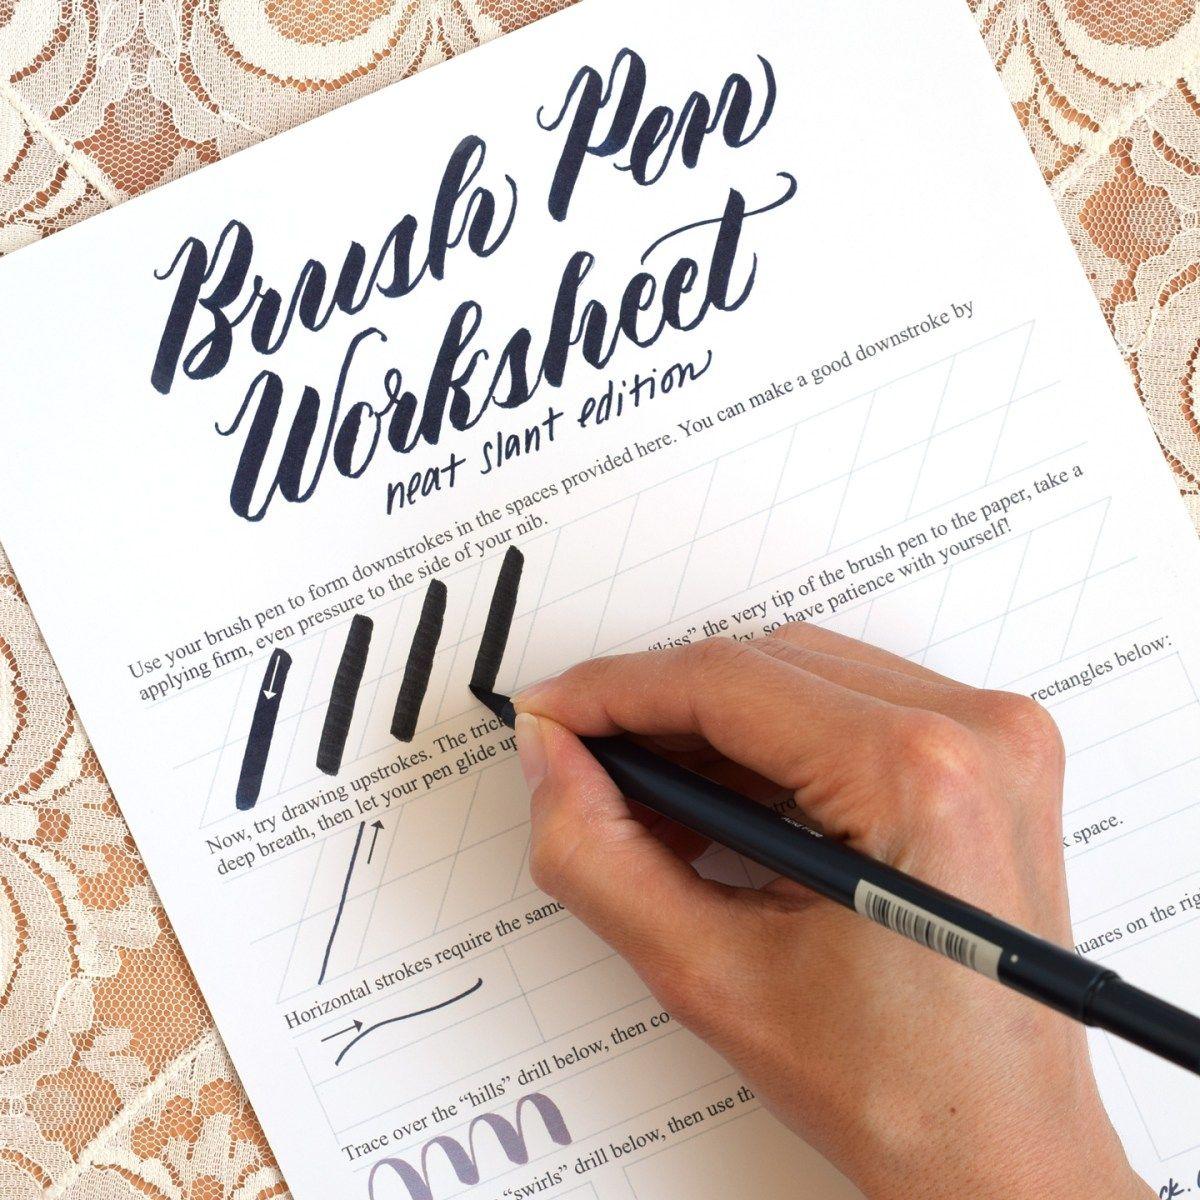 Free Brush Pen Calligraphy Worksheet: Neat Slant Edition